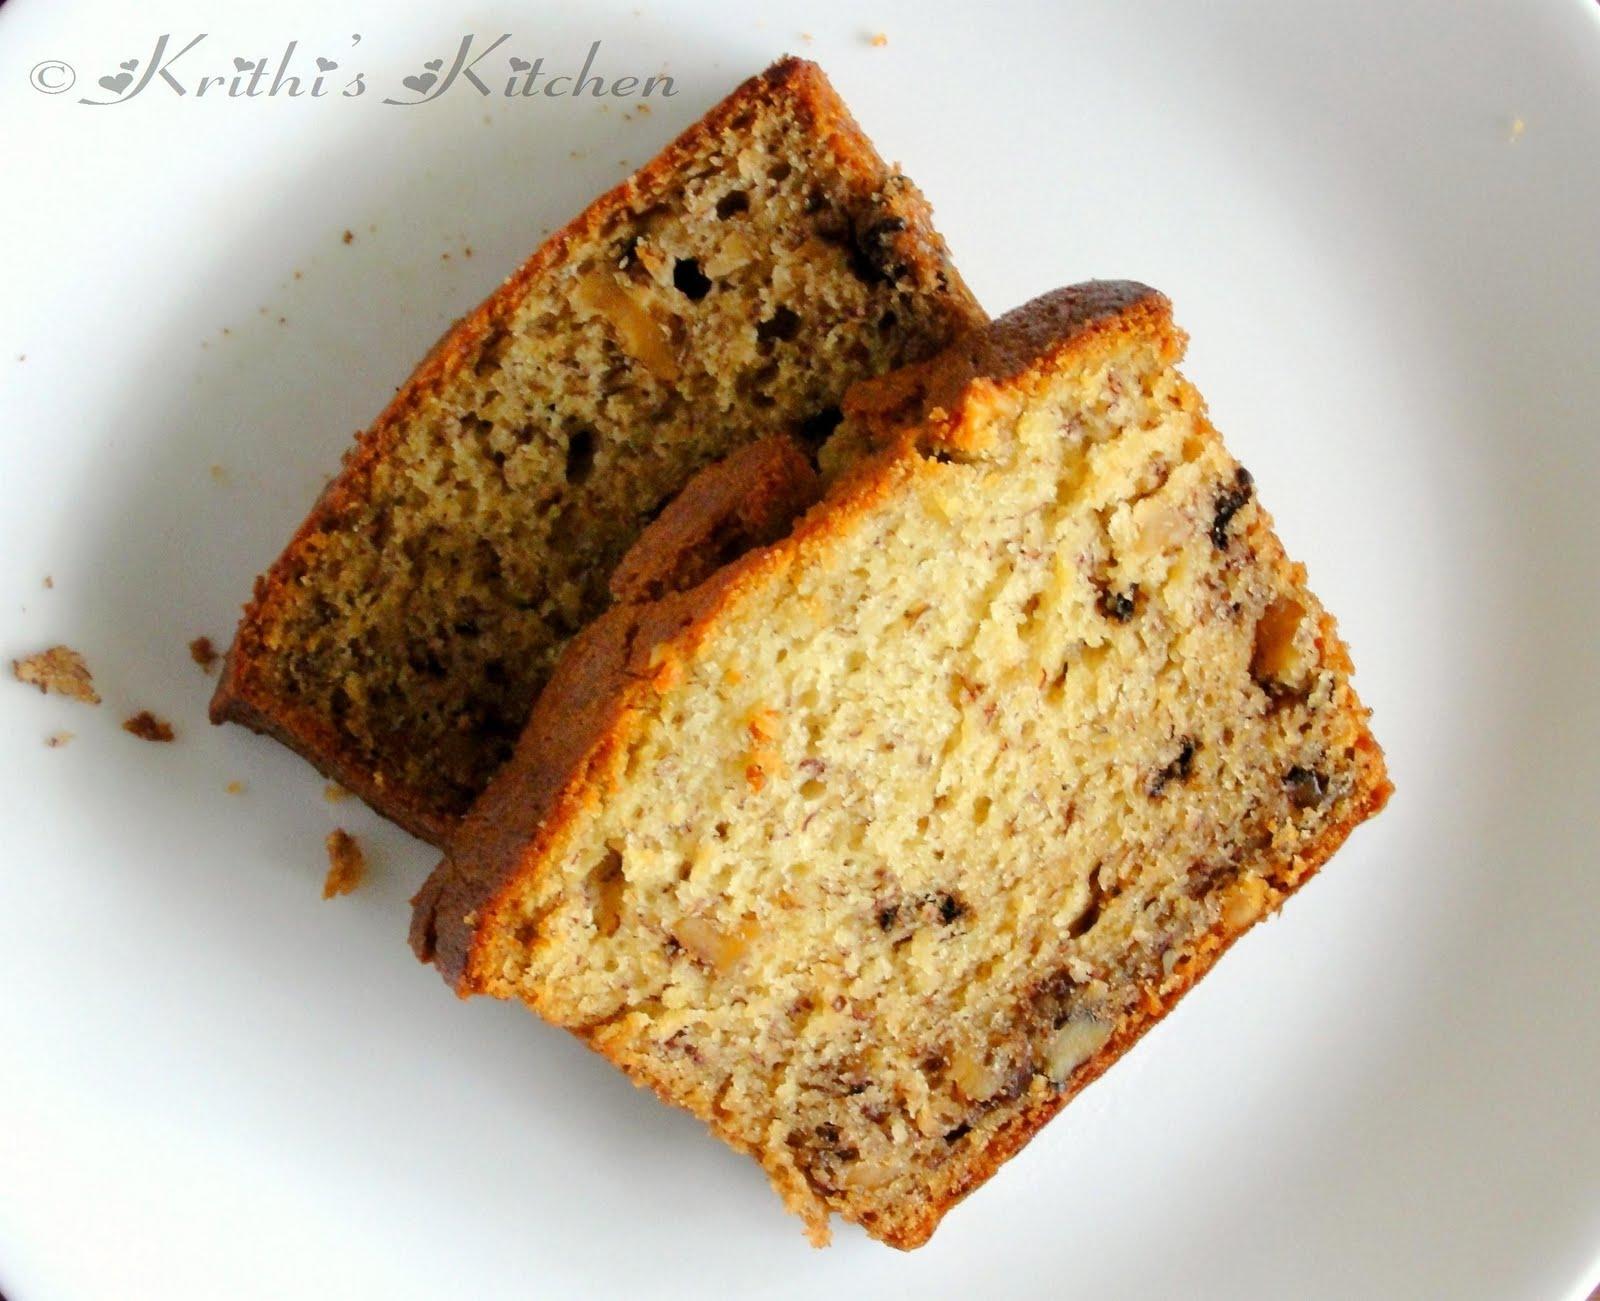 Krithi's Kitchen: Banana Walnut Bread